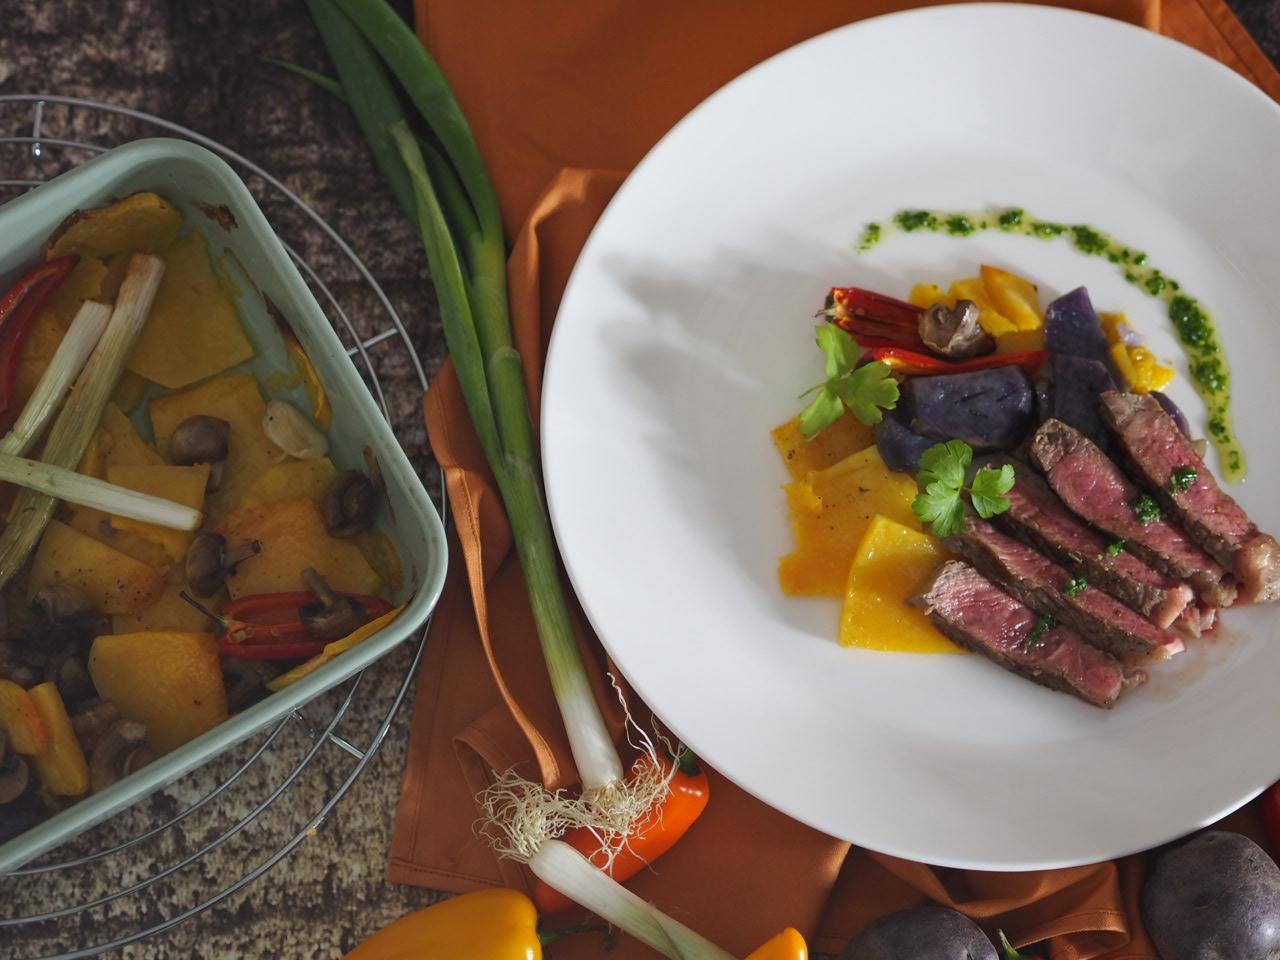 Steak mit Vitelotte Trüffelkartoffel Muskatkürbis Ofengemüse und grünem Salsa Pesto